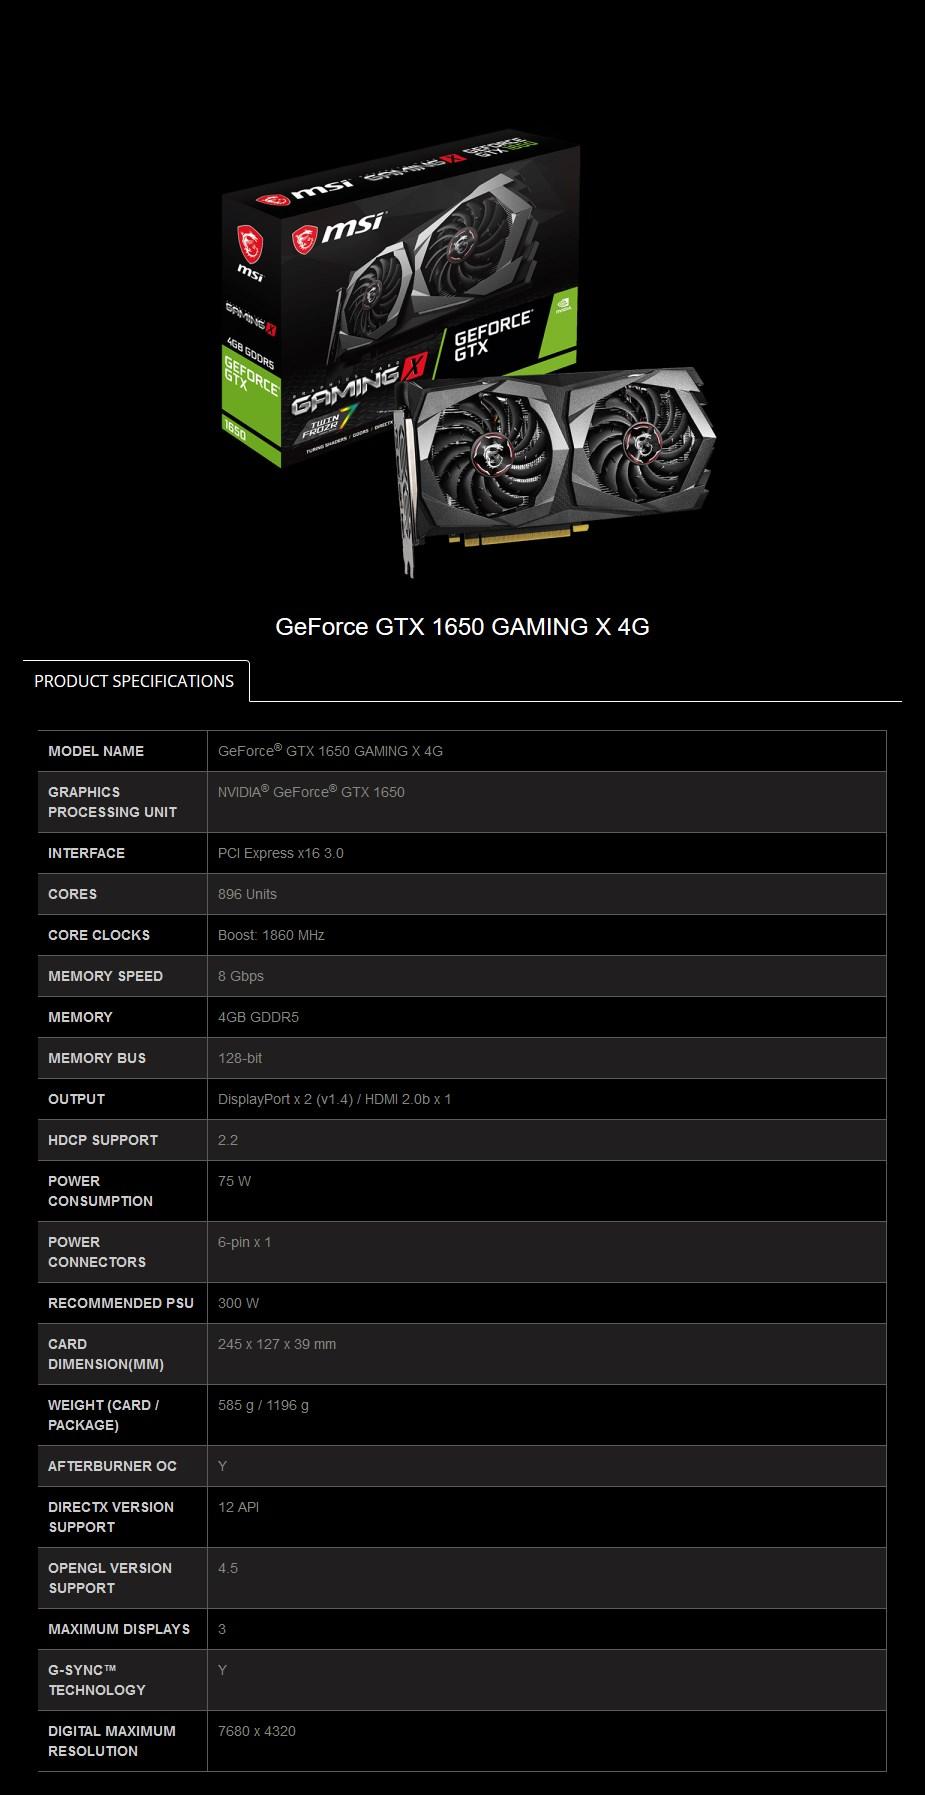 MSI GeForce GTX 1650 Gaming X 4GB Video Card - Desktop Overview 2